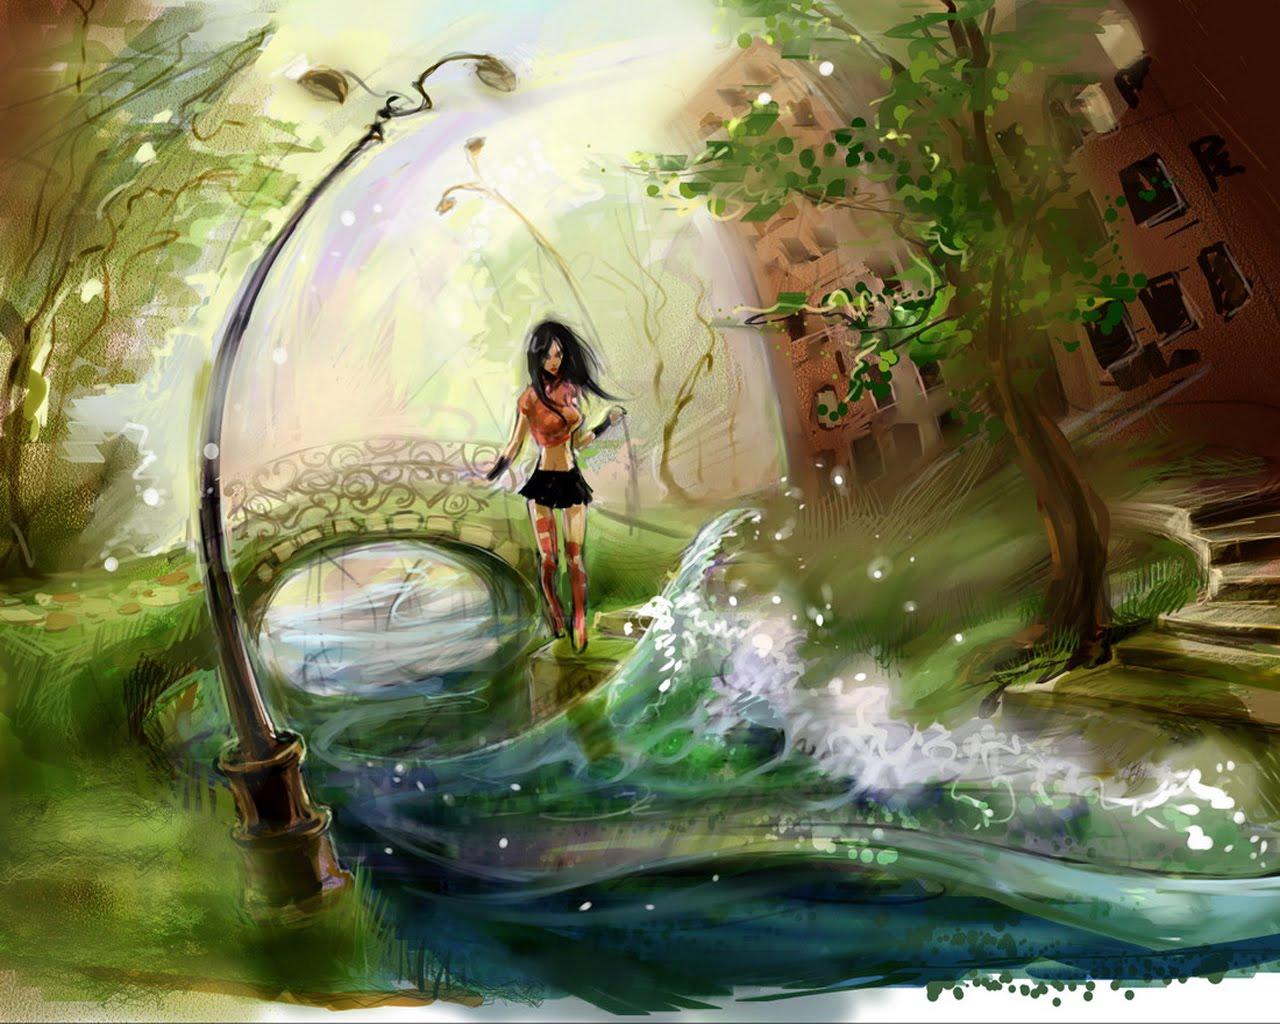 Beautiful Women Artistic Paintings Desktop Backgrounds Wallpaper 1280x1024